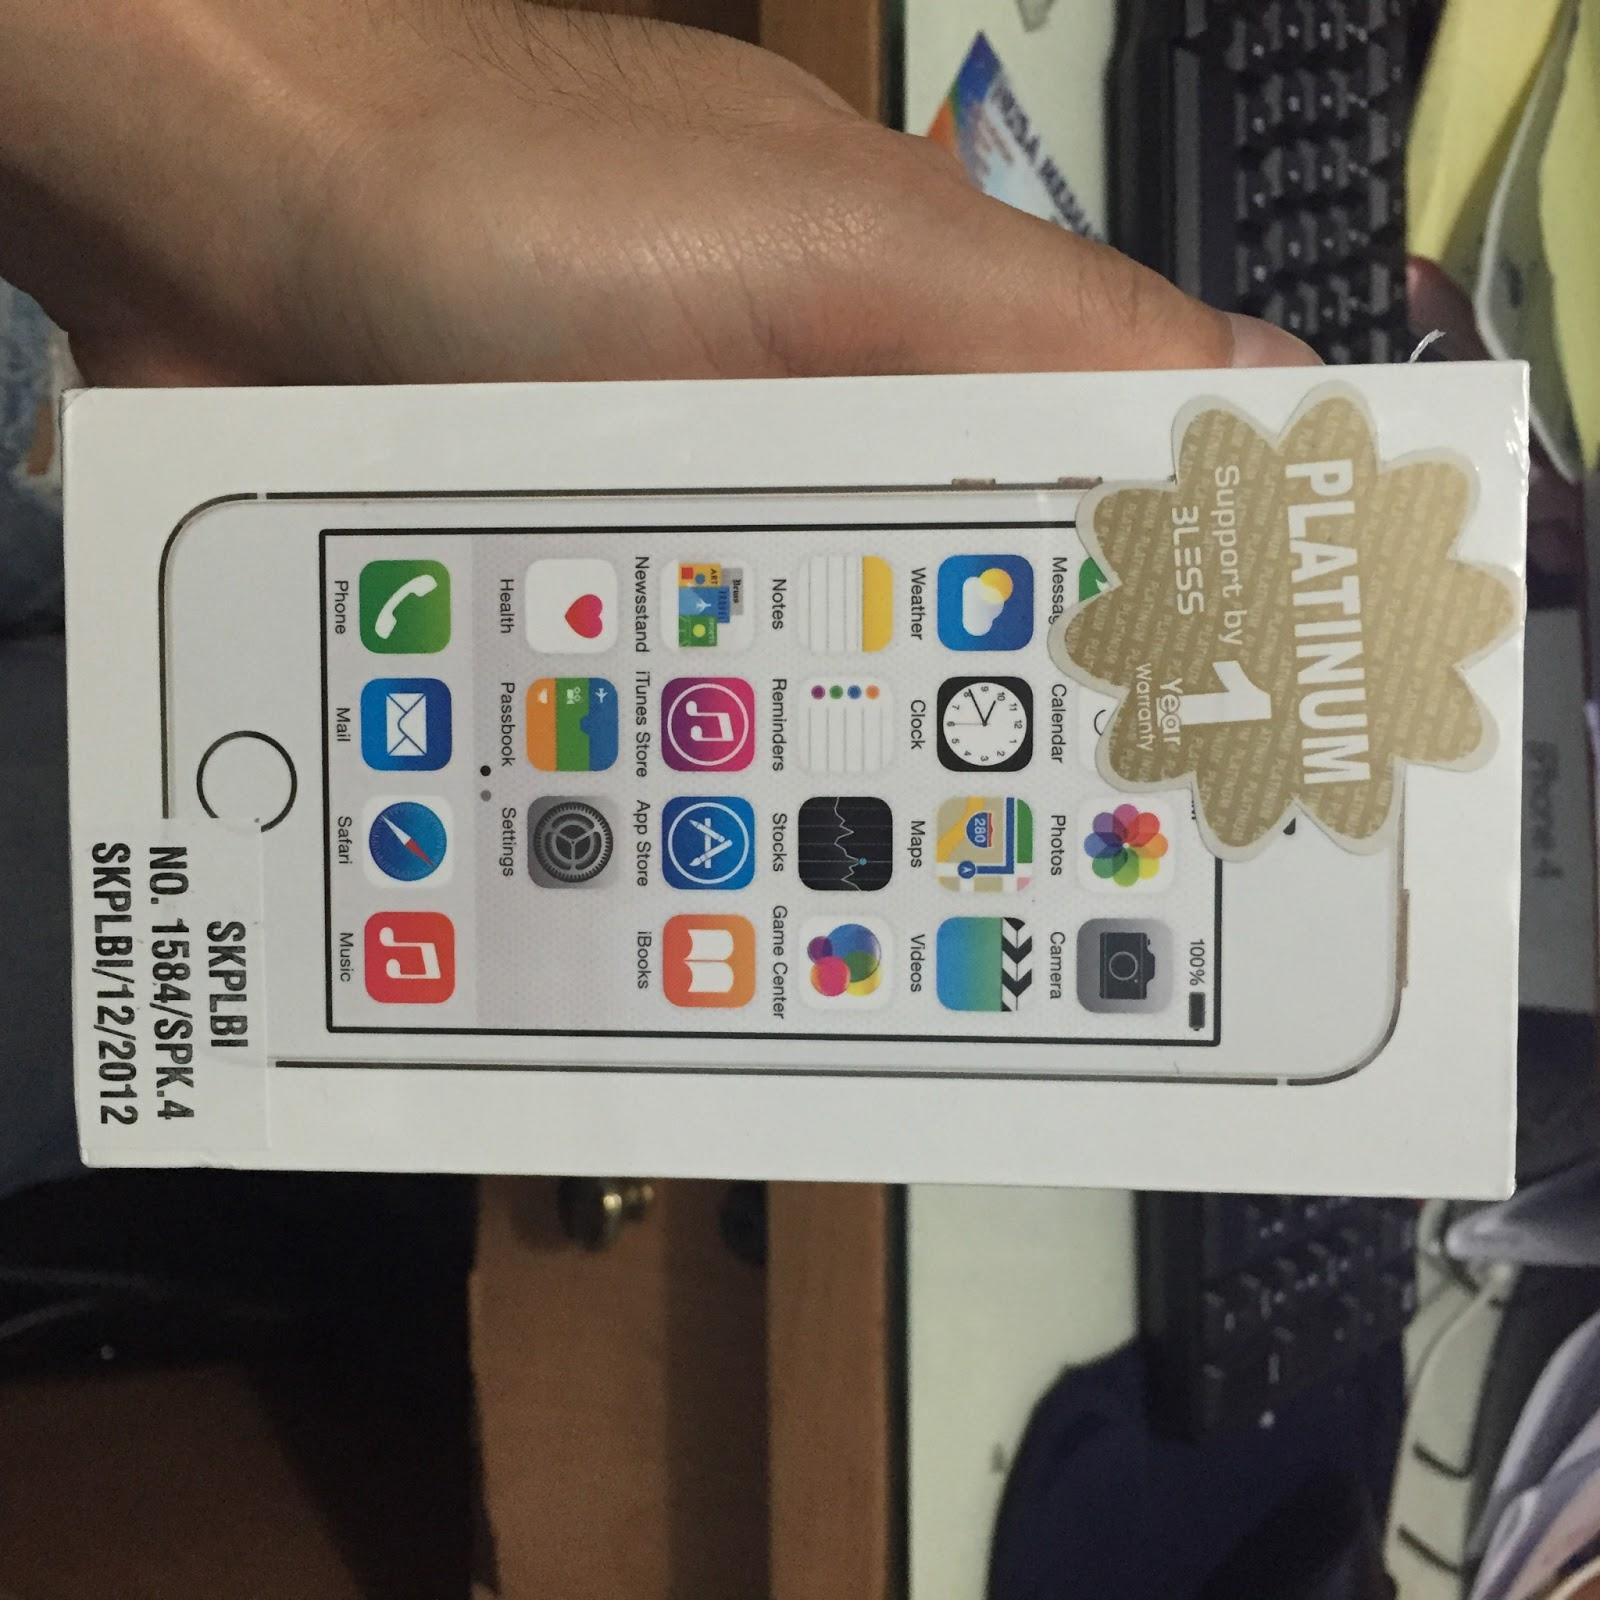 Membedakan Garansi Iphone International Vs Resmi Distributor 5 32gb 1 Tahun Dusbox Bcell Platinum The One Bless